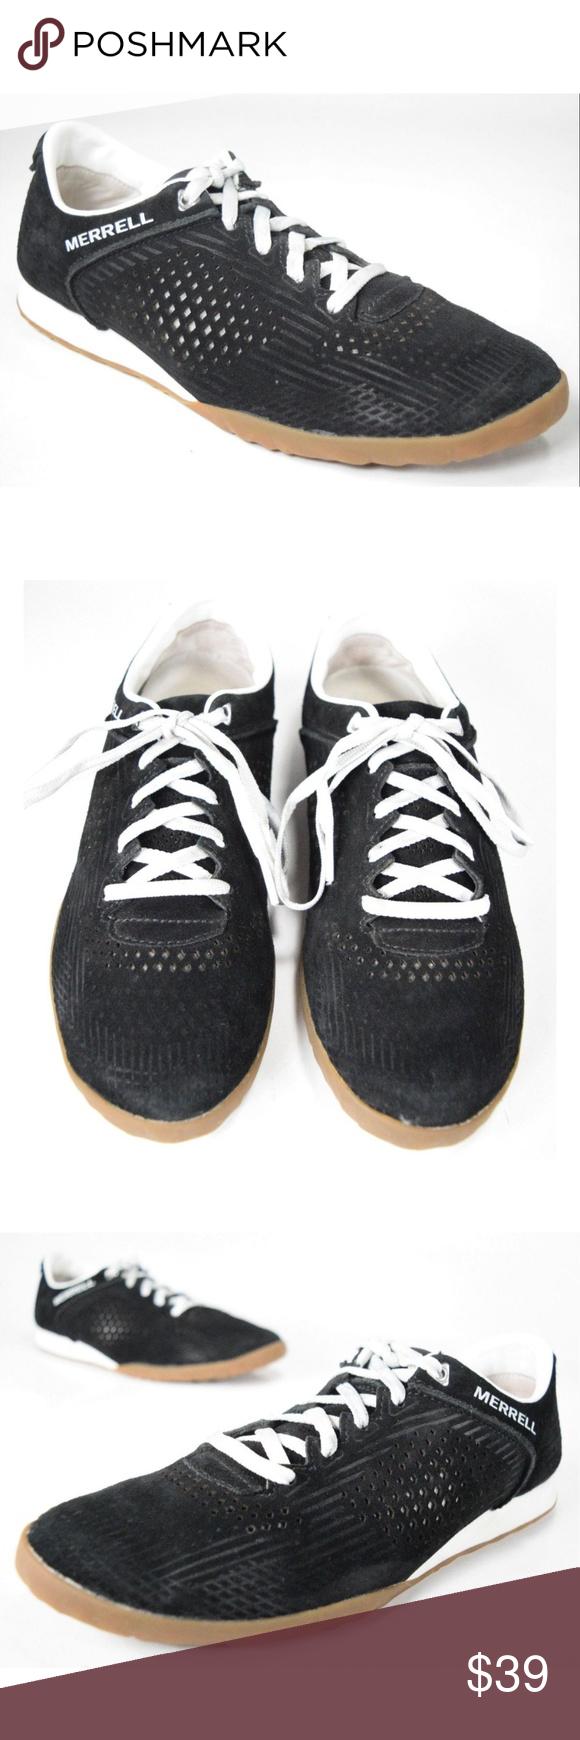 timeless design temperament shoes convenience goods Merrell Black Suede CIVET SPORT BREEZE Shoes This is a pair ...